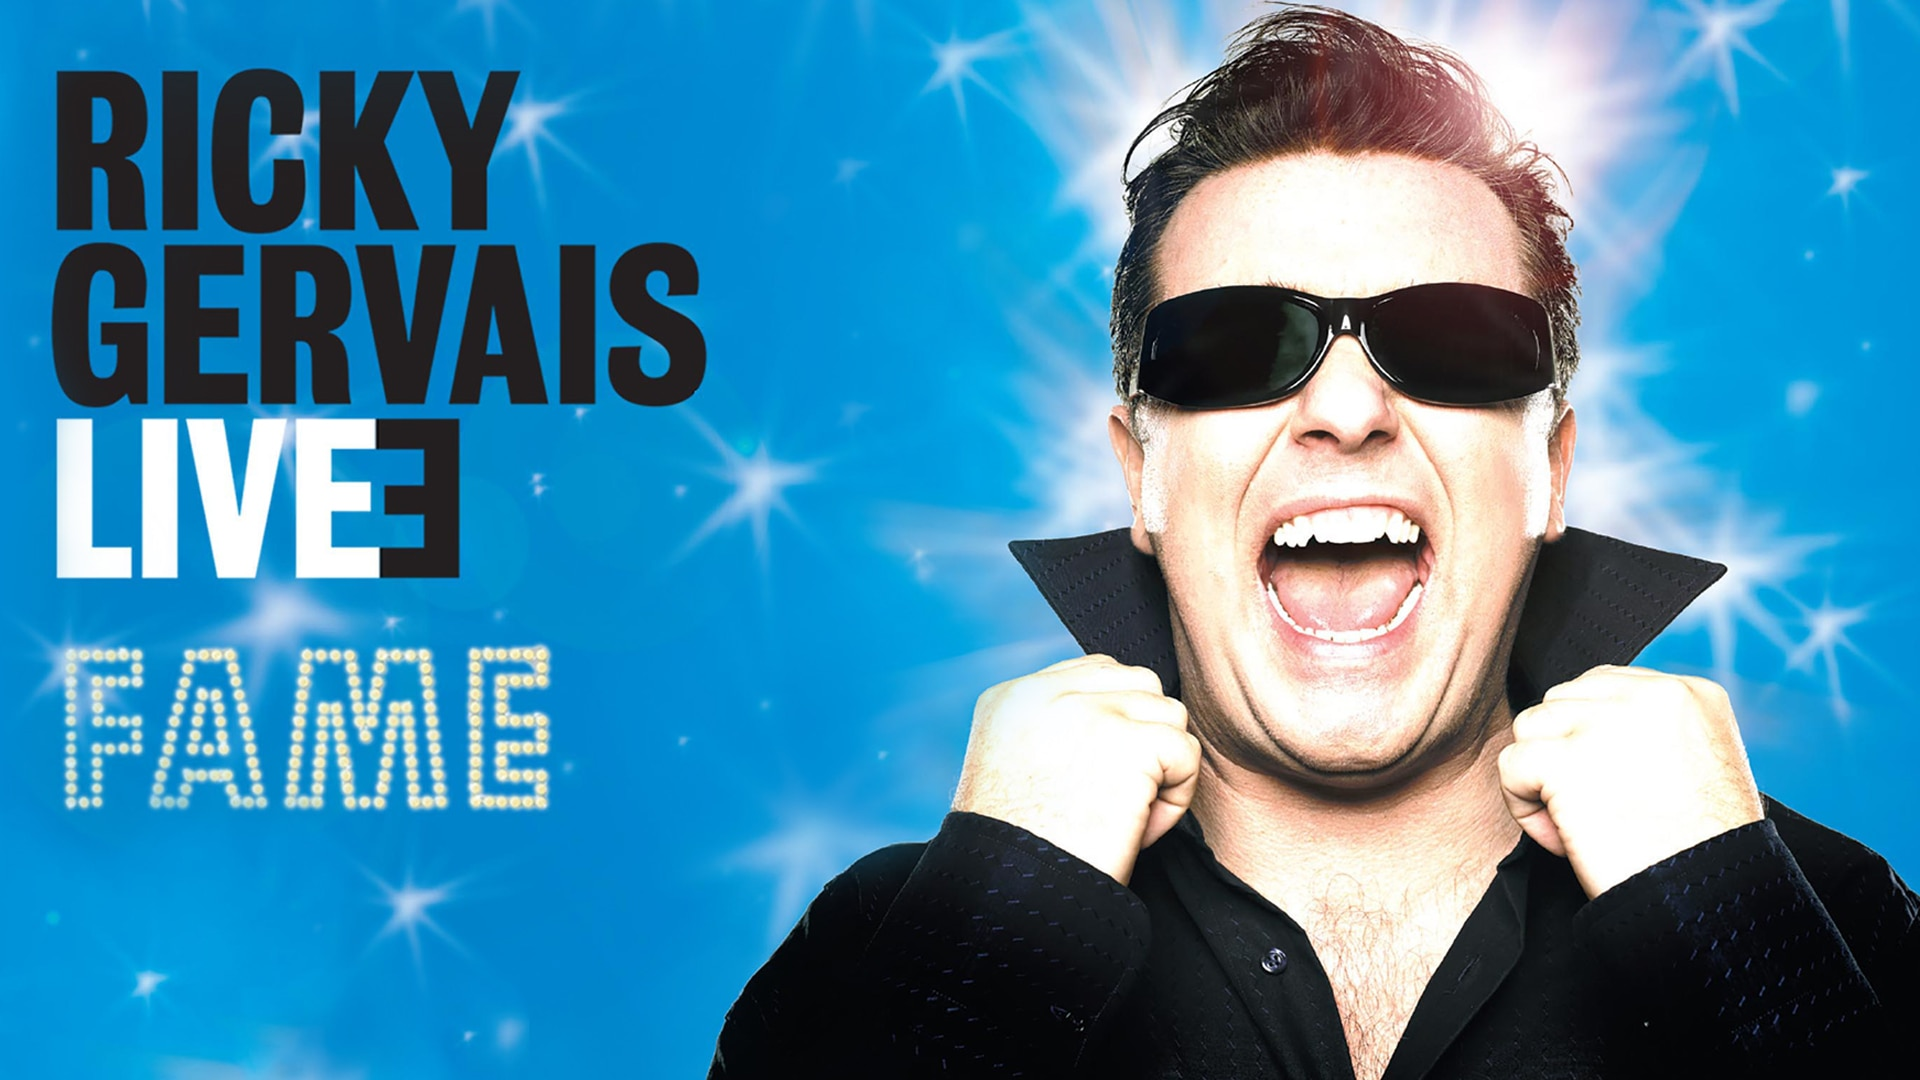 Ricky Gervais Live Fame